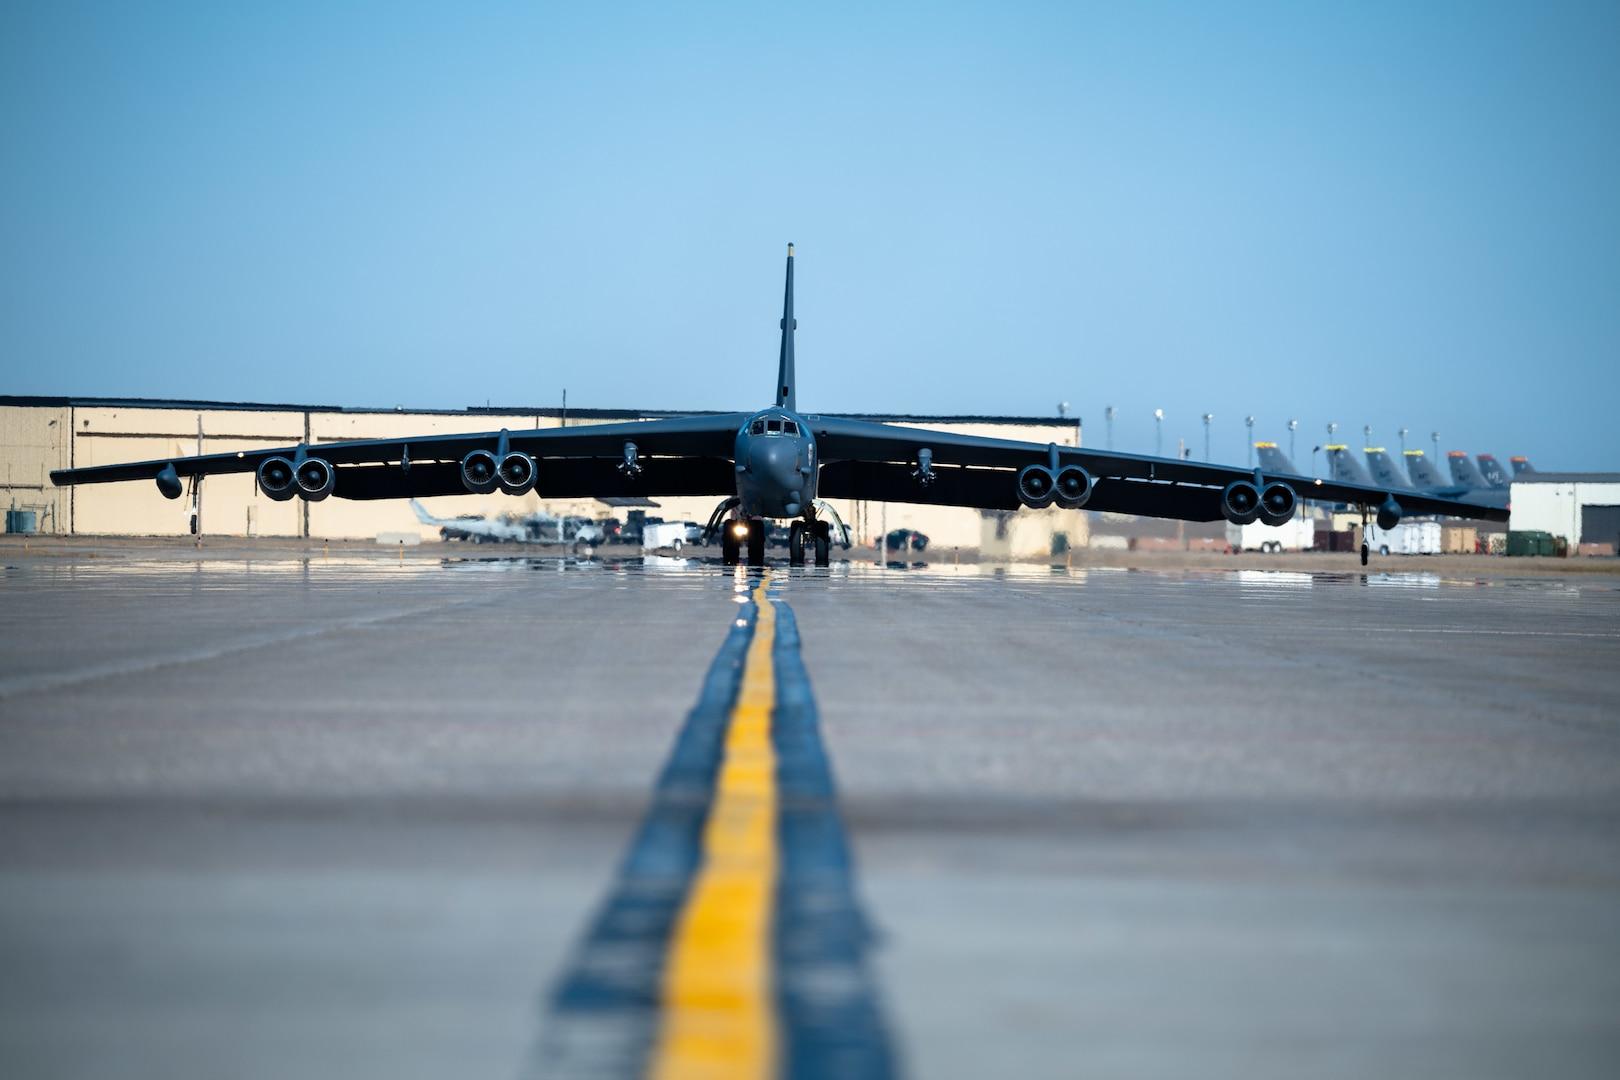 B-52 sits on runway